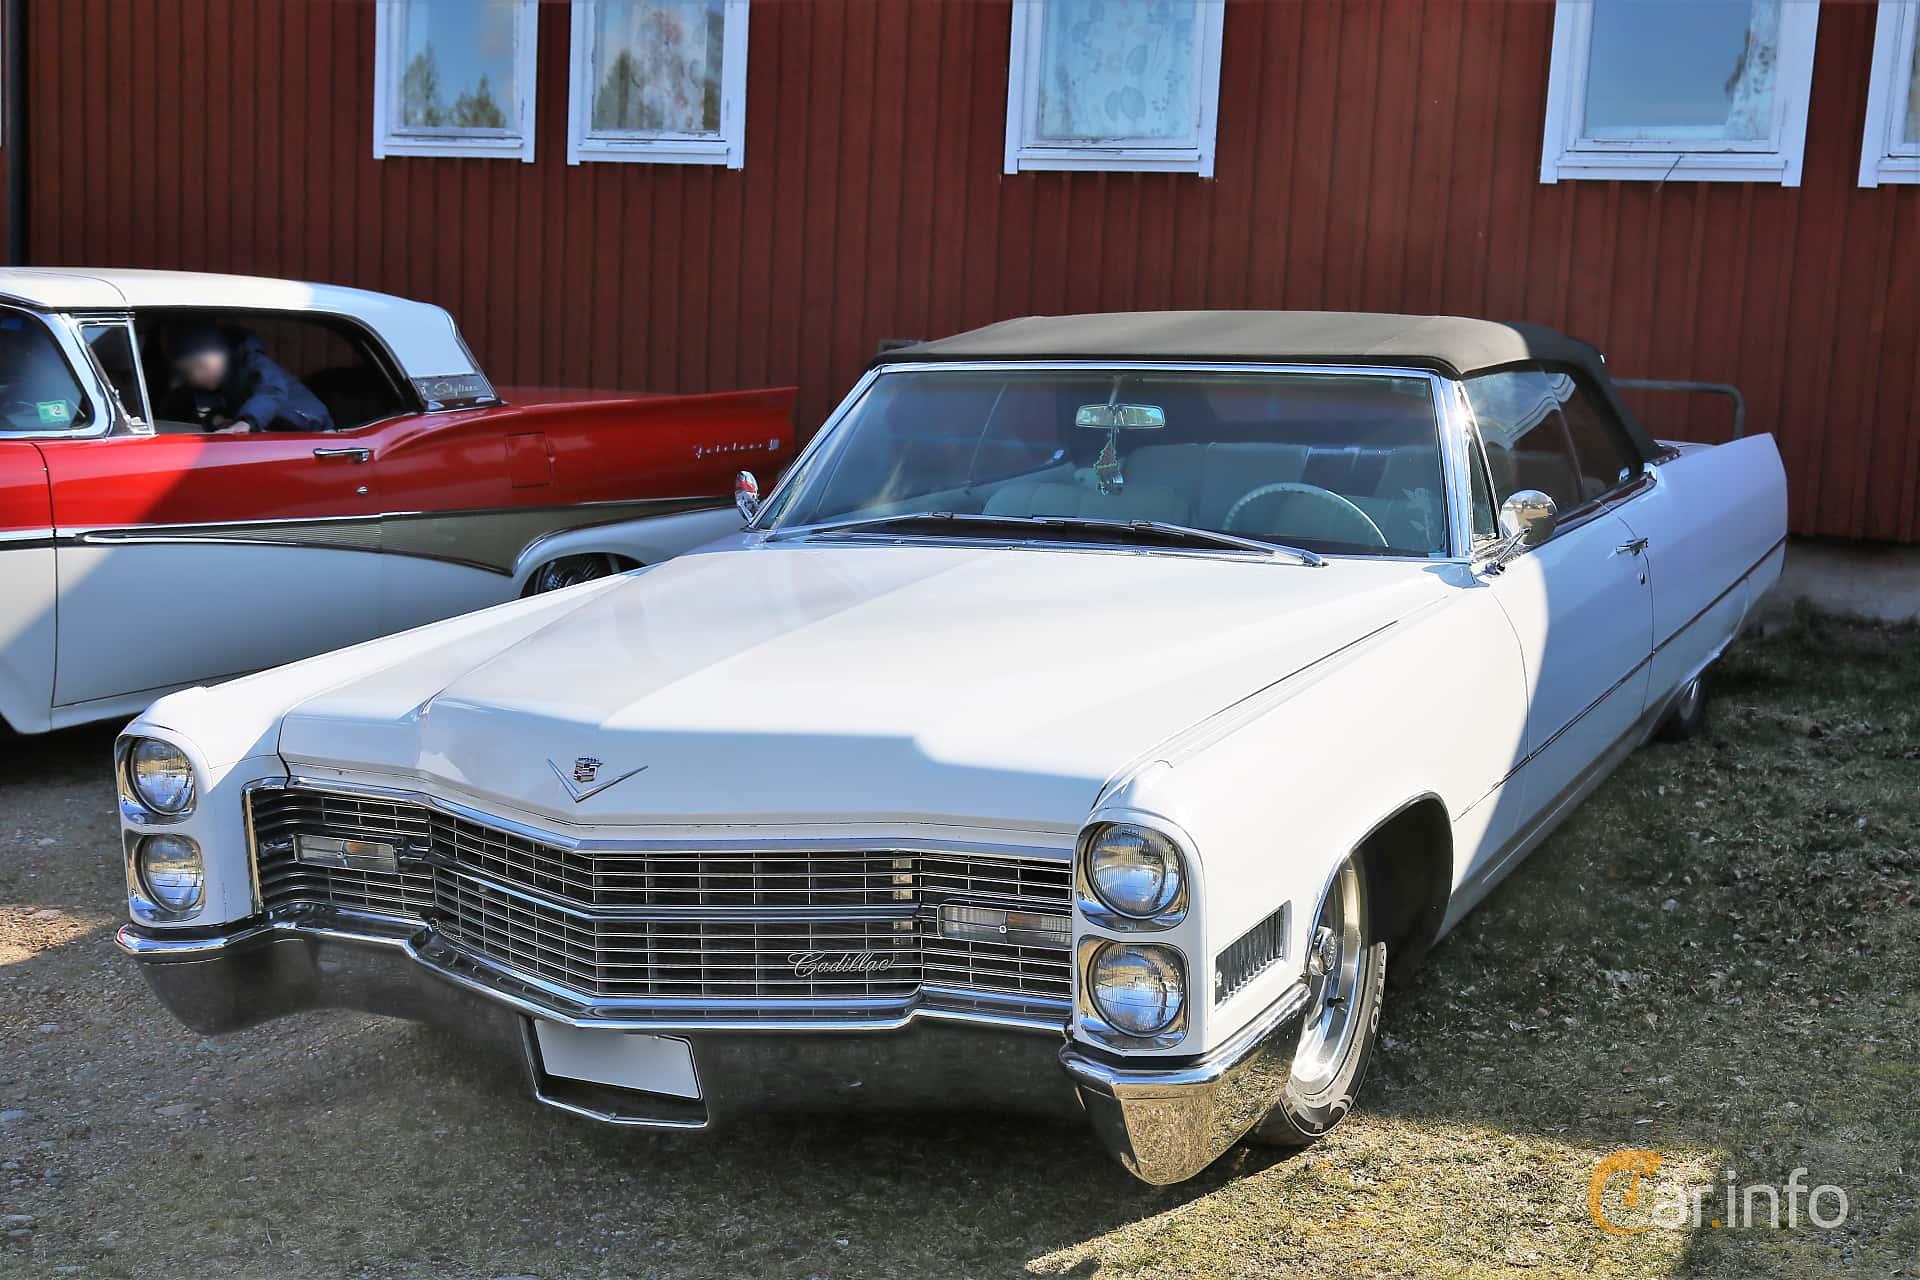 Front/Side  of Cadillac De Ville Convertible 7.0 V8 OHV Hydra-Matic, 345ps, 1966 at Uddevalla Veteranbilsmarknad Backamo, Ljungsk 2019